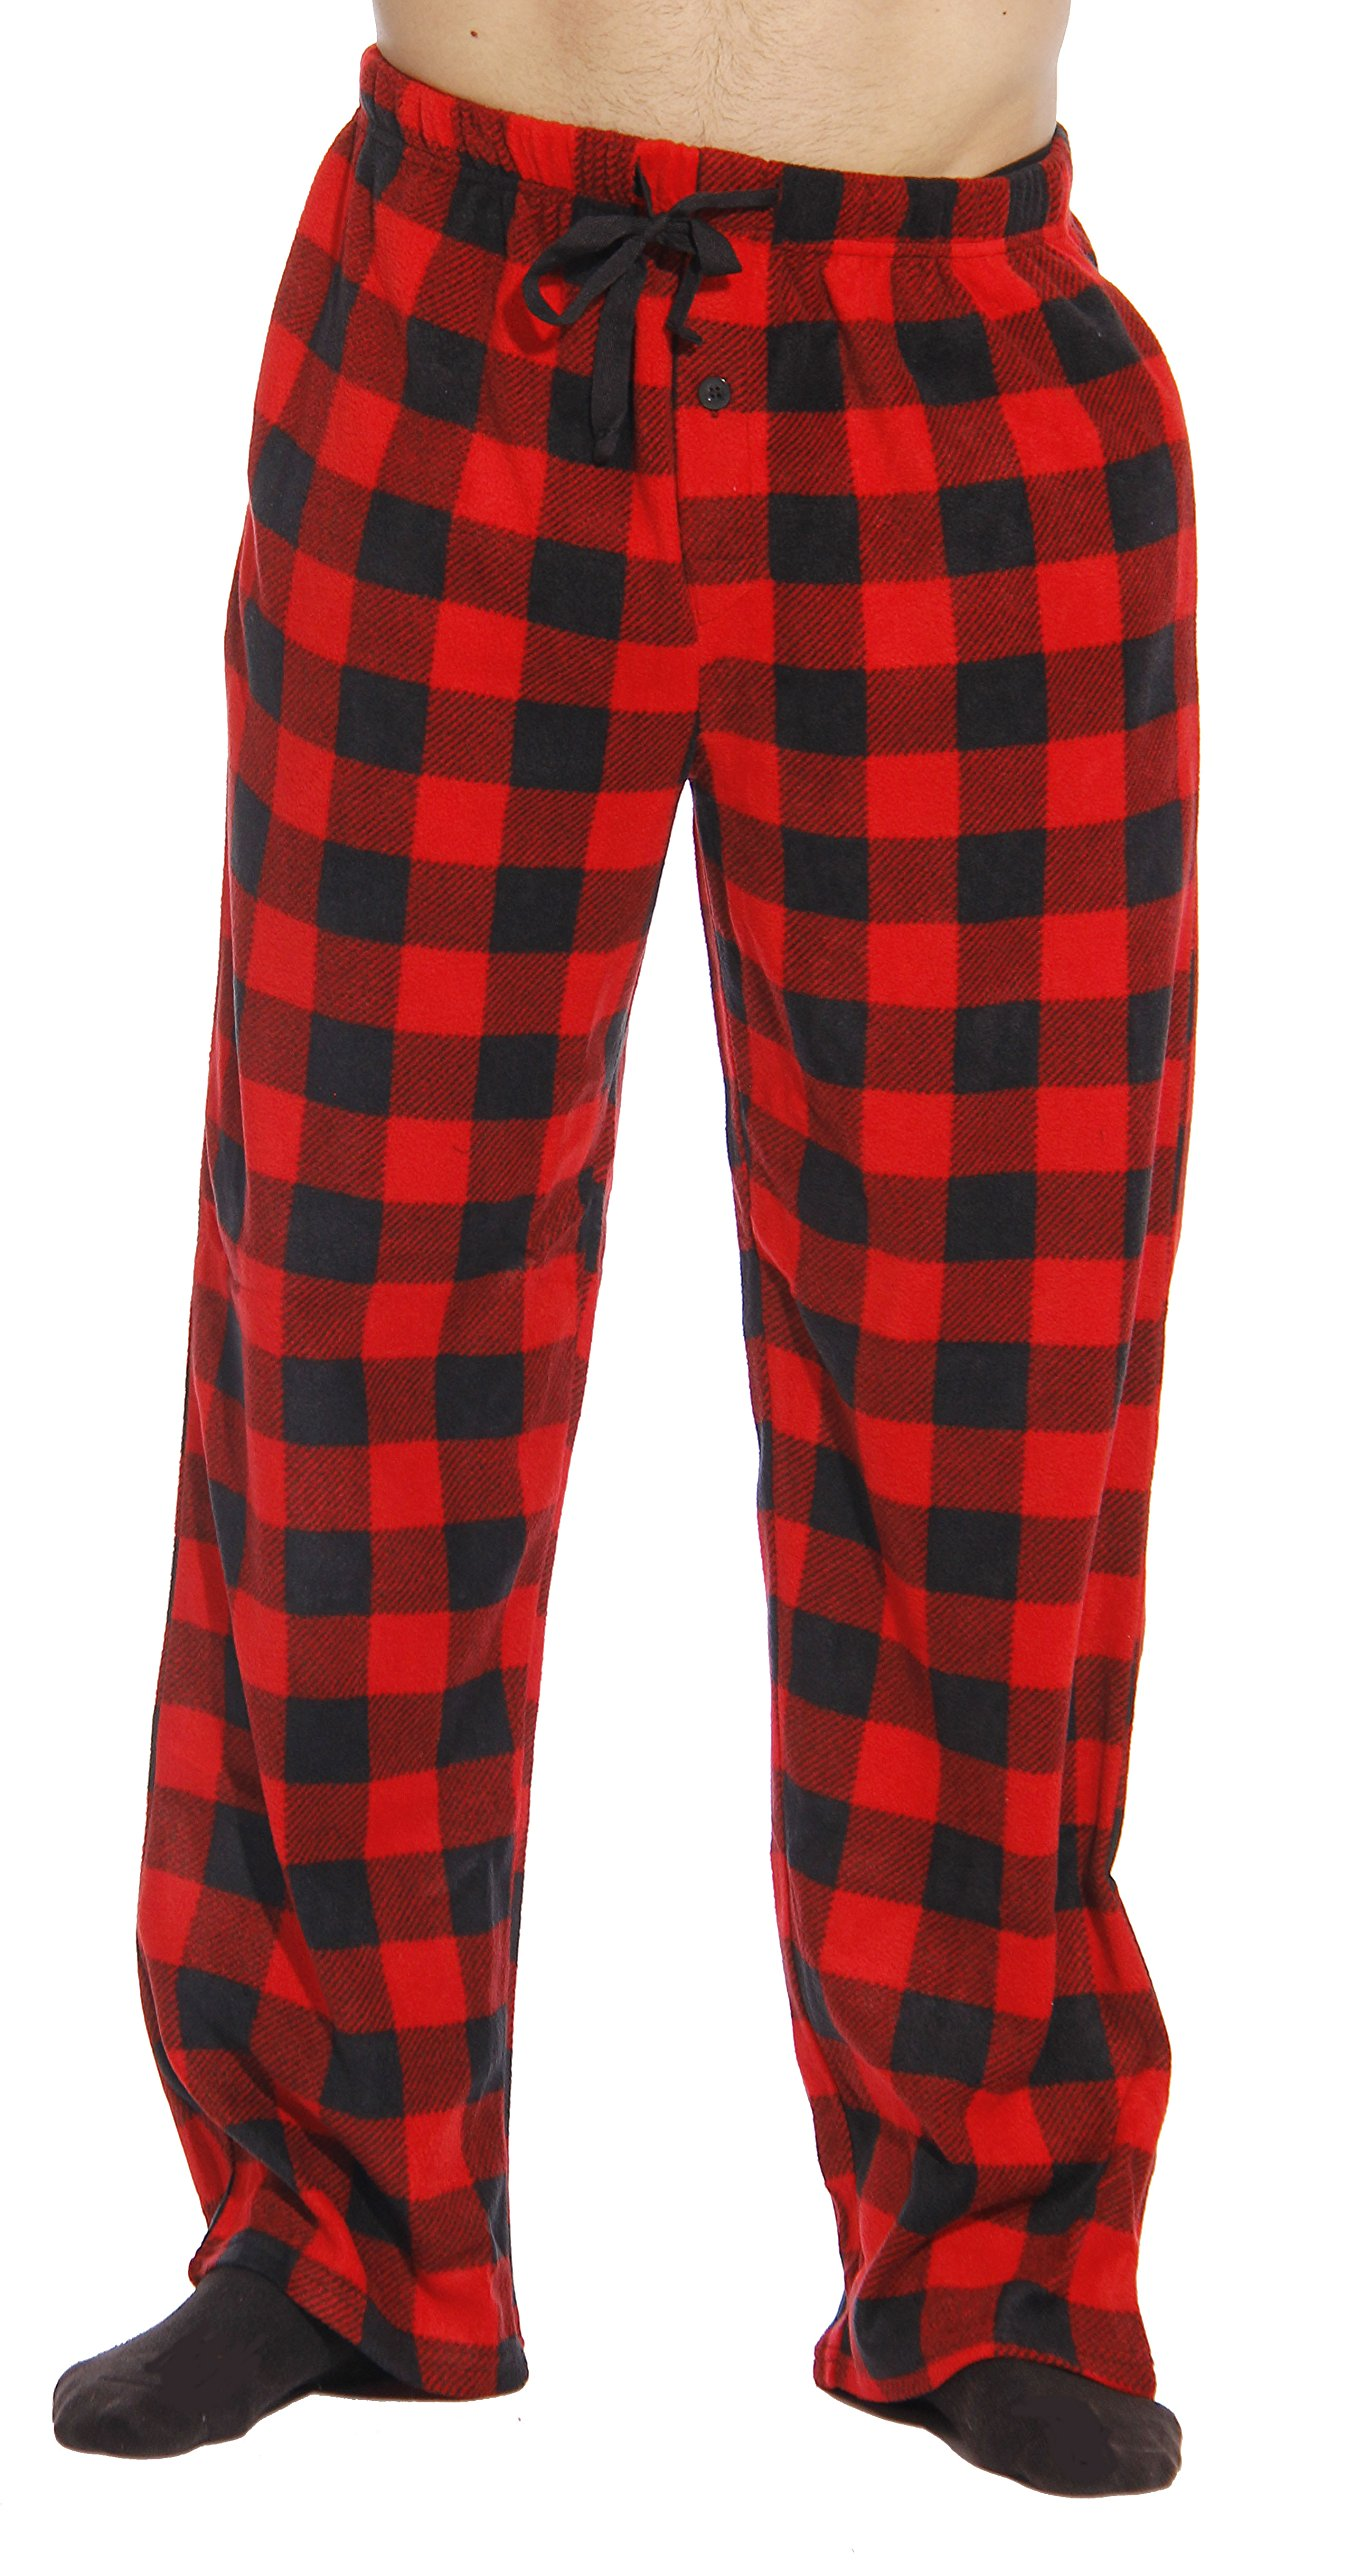 #FollowMe 45902-1A-M Polar Fleece Pajama Pants for Men/Sleepwear/PJs, Red Buffalo Plaid, Medium